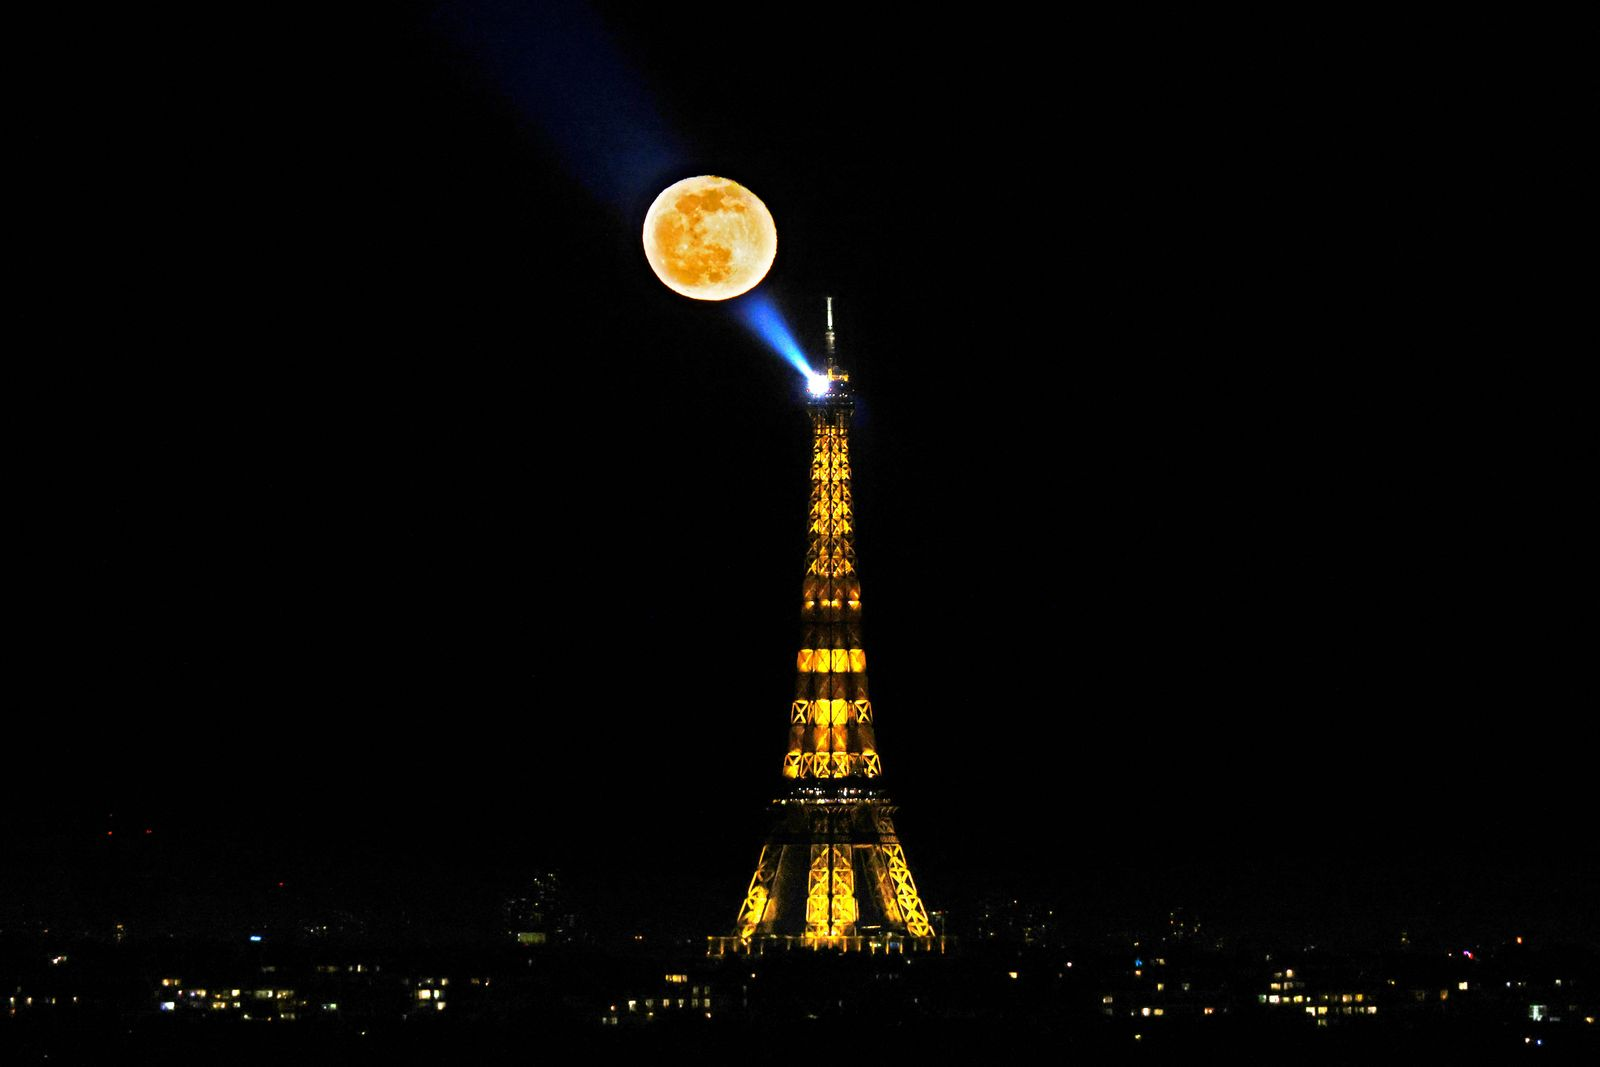 TOPSHOT-FRANCE-PARIS-MOON